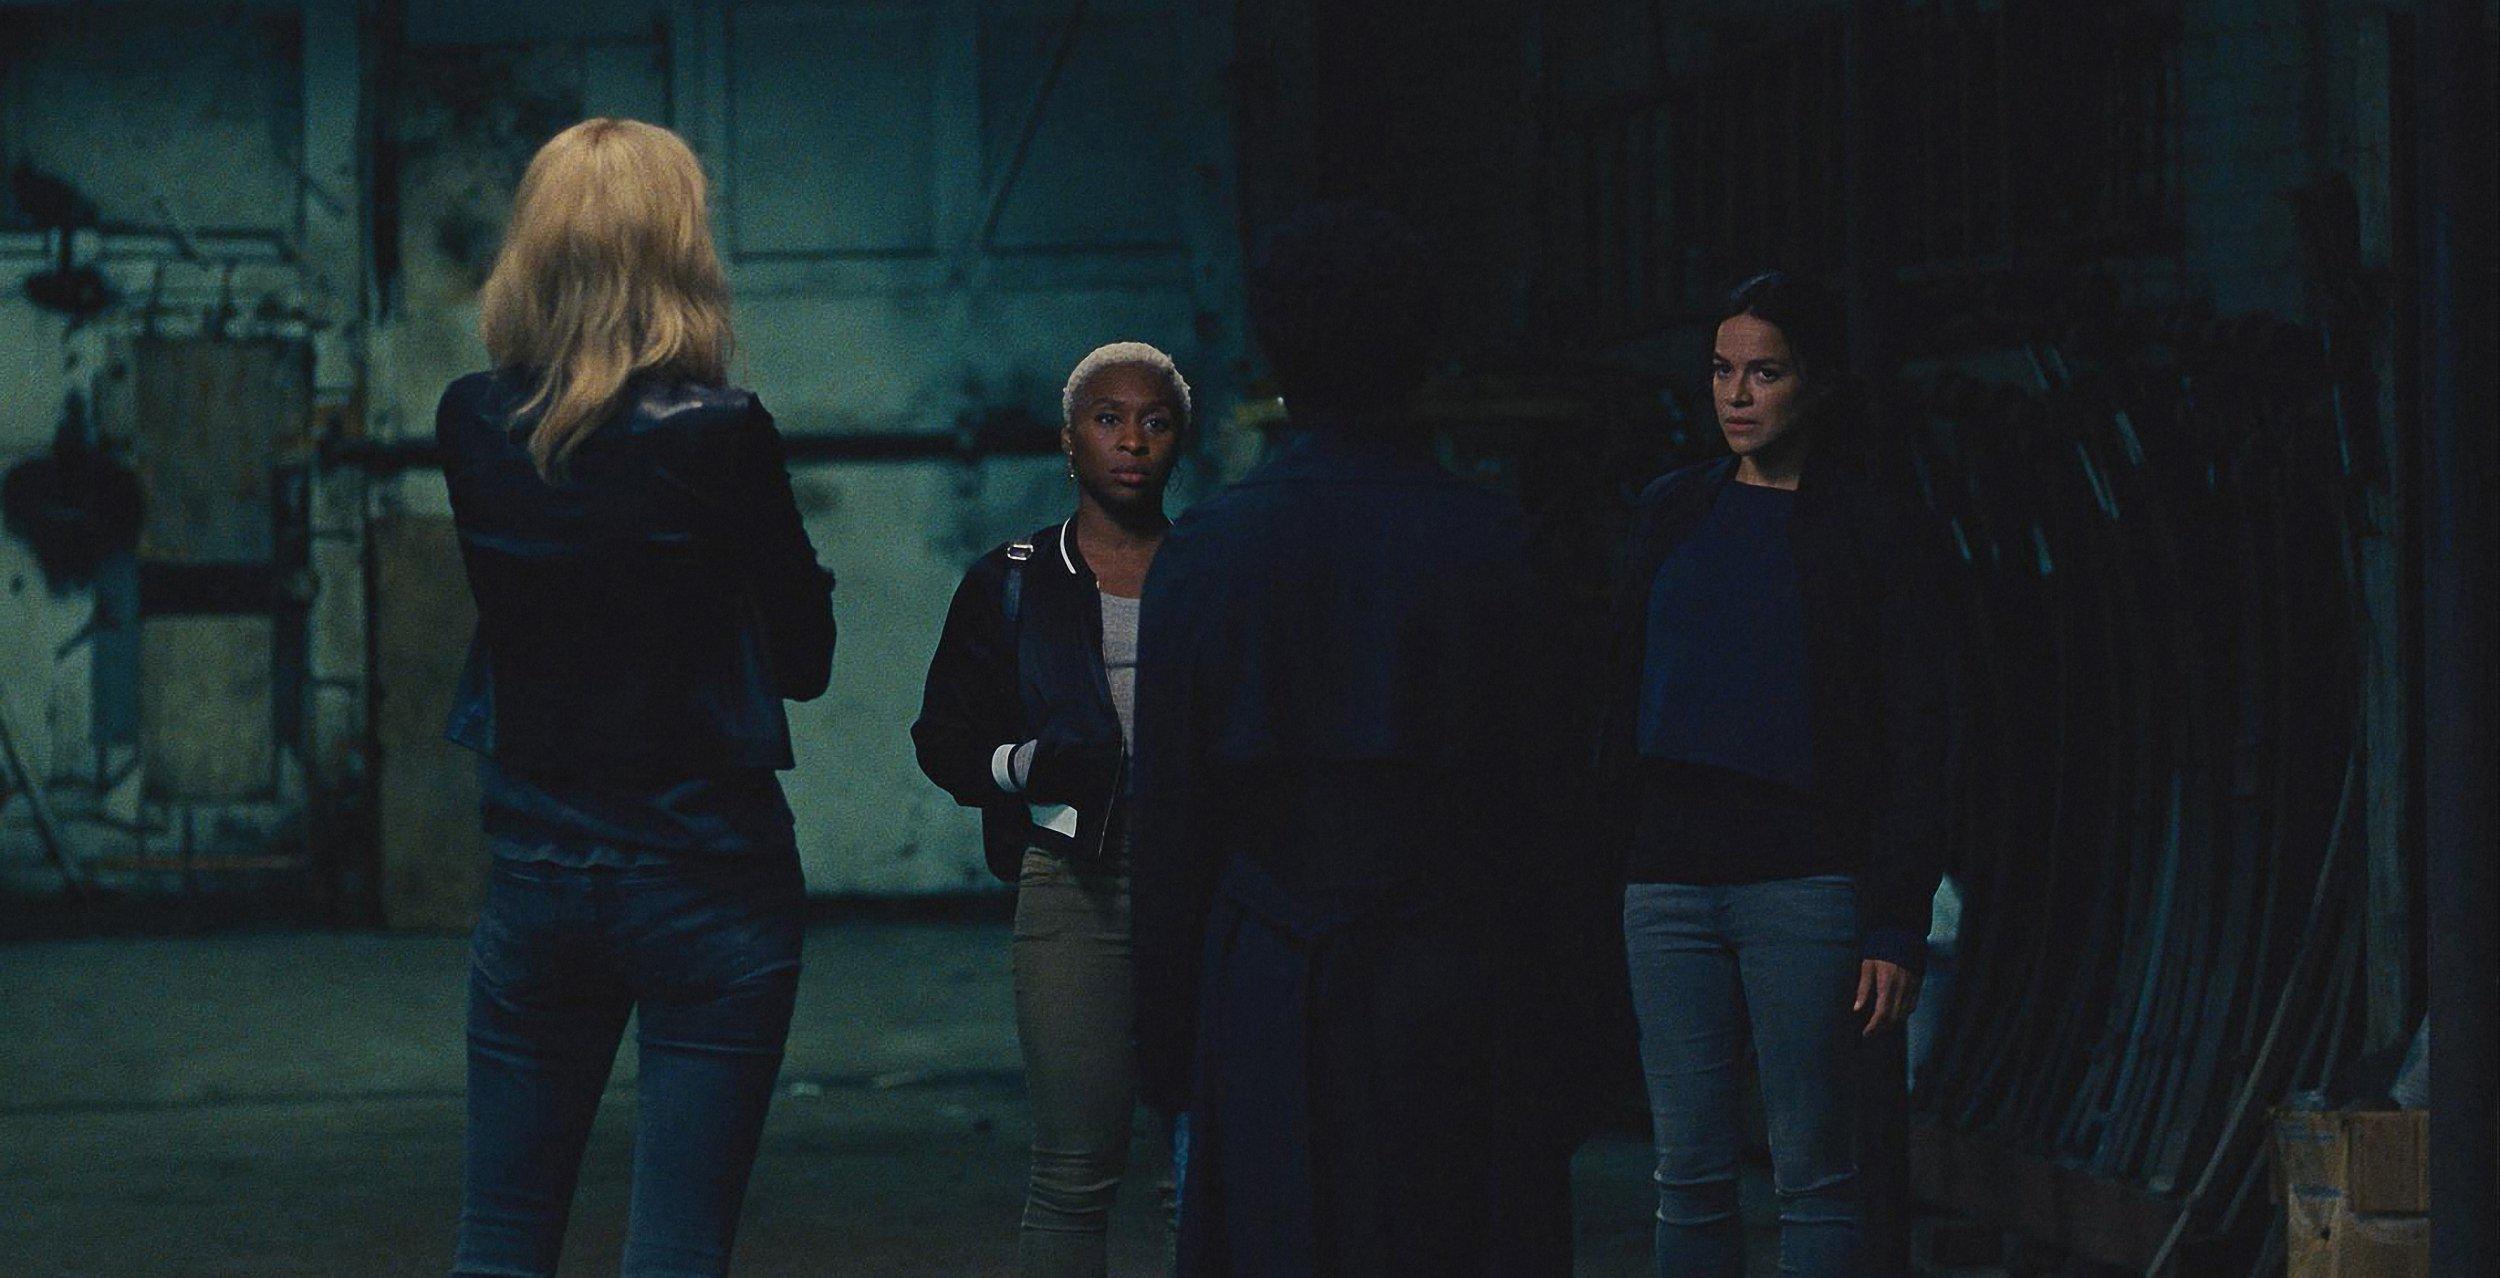 L-R: Elizabeth Debicki (back to camera), Cynthia Erivo, Viola Davis (back to camera), and Michelle Rodriguez star in Twentieth Century Fox???s WIDOWS. Photo Credit: Courtesy Twentieth Century Fox.